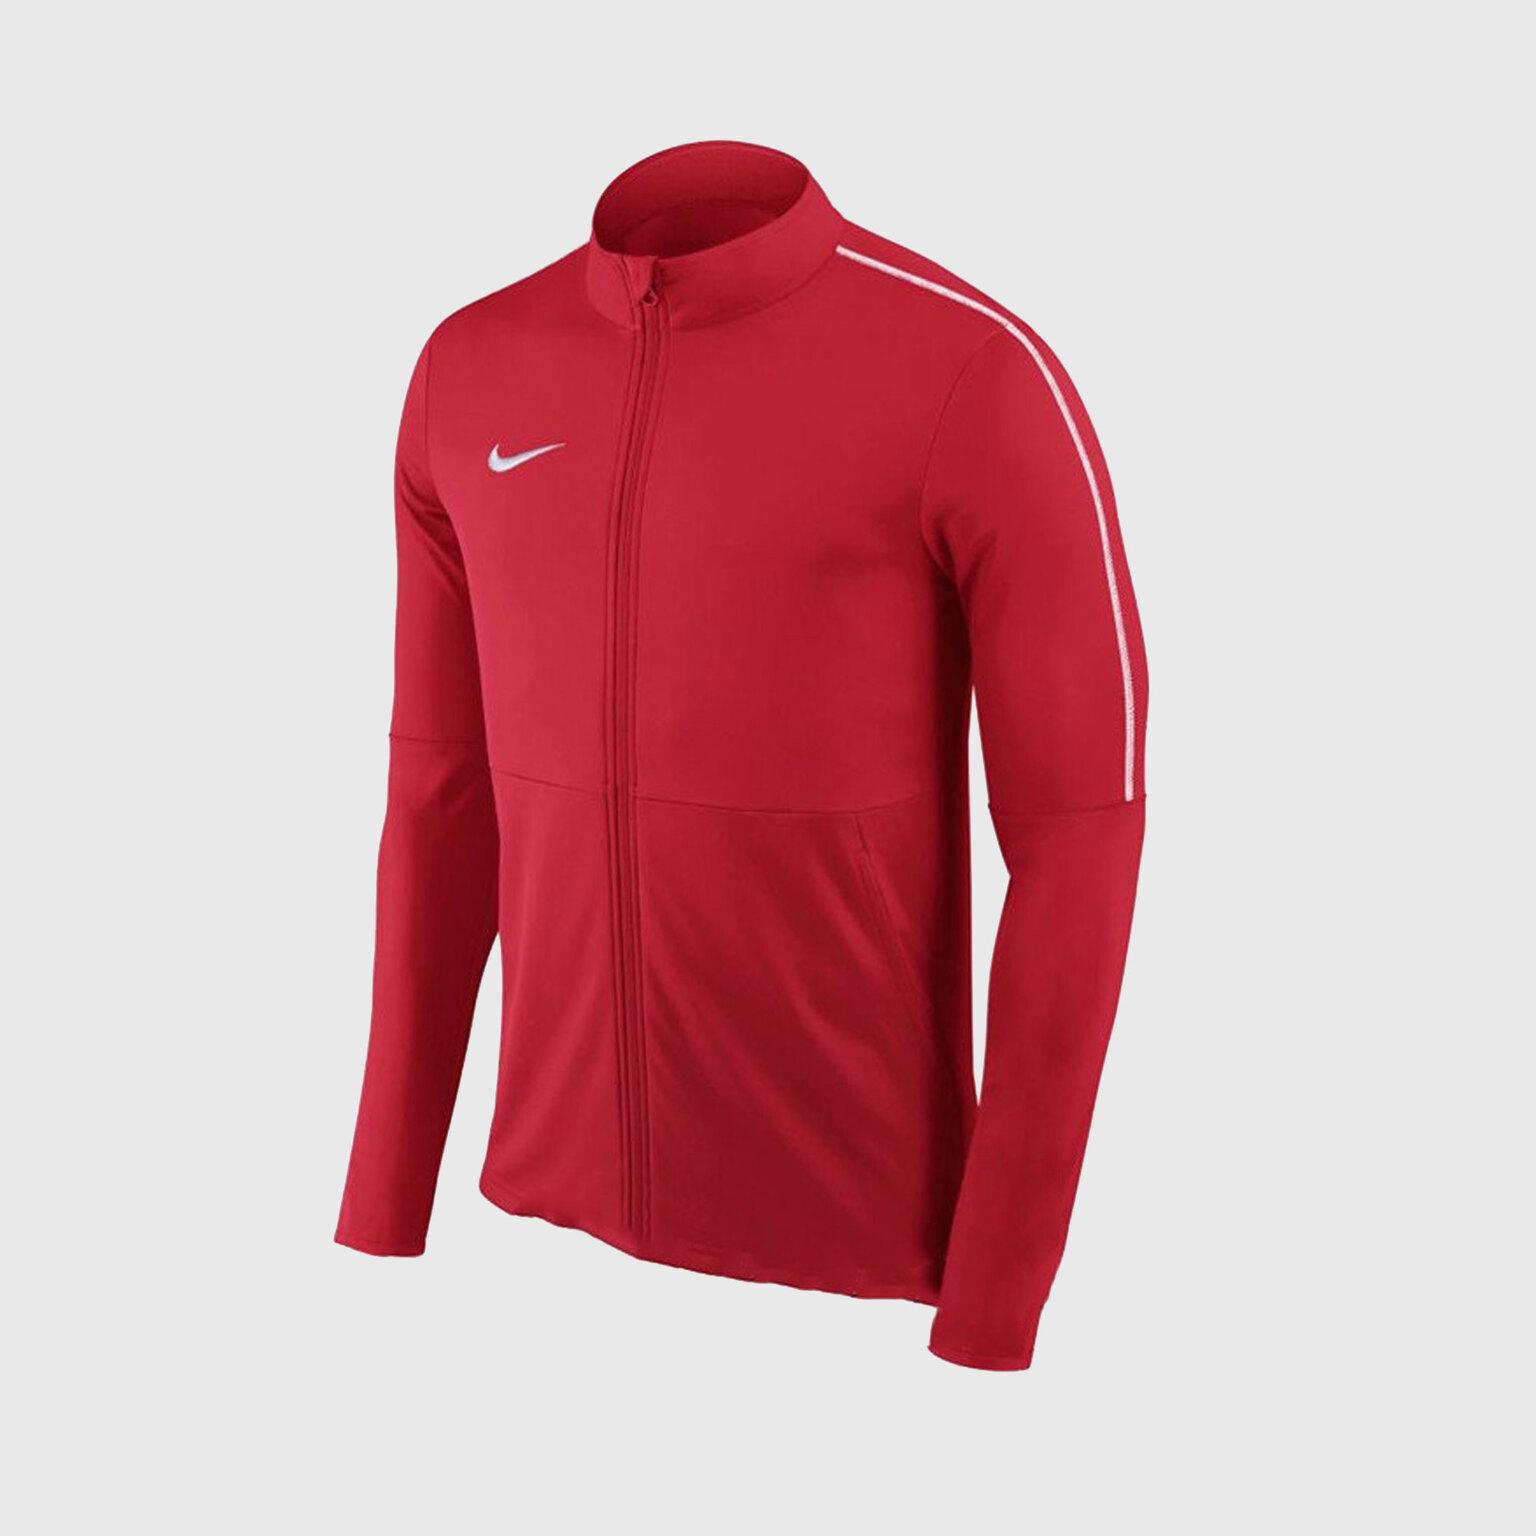 Куртка для костюма подростковая Nike Park18 AA2071-657 куртка спортивная nike guild 550 jacket 693529 657